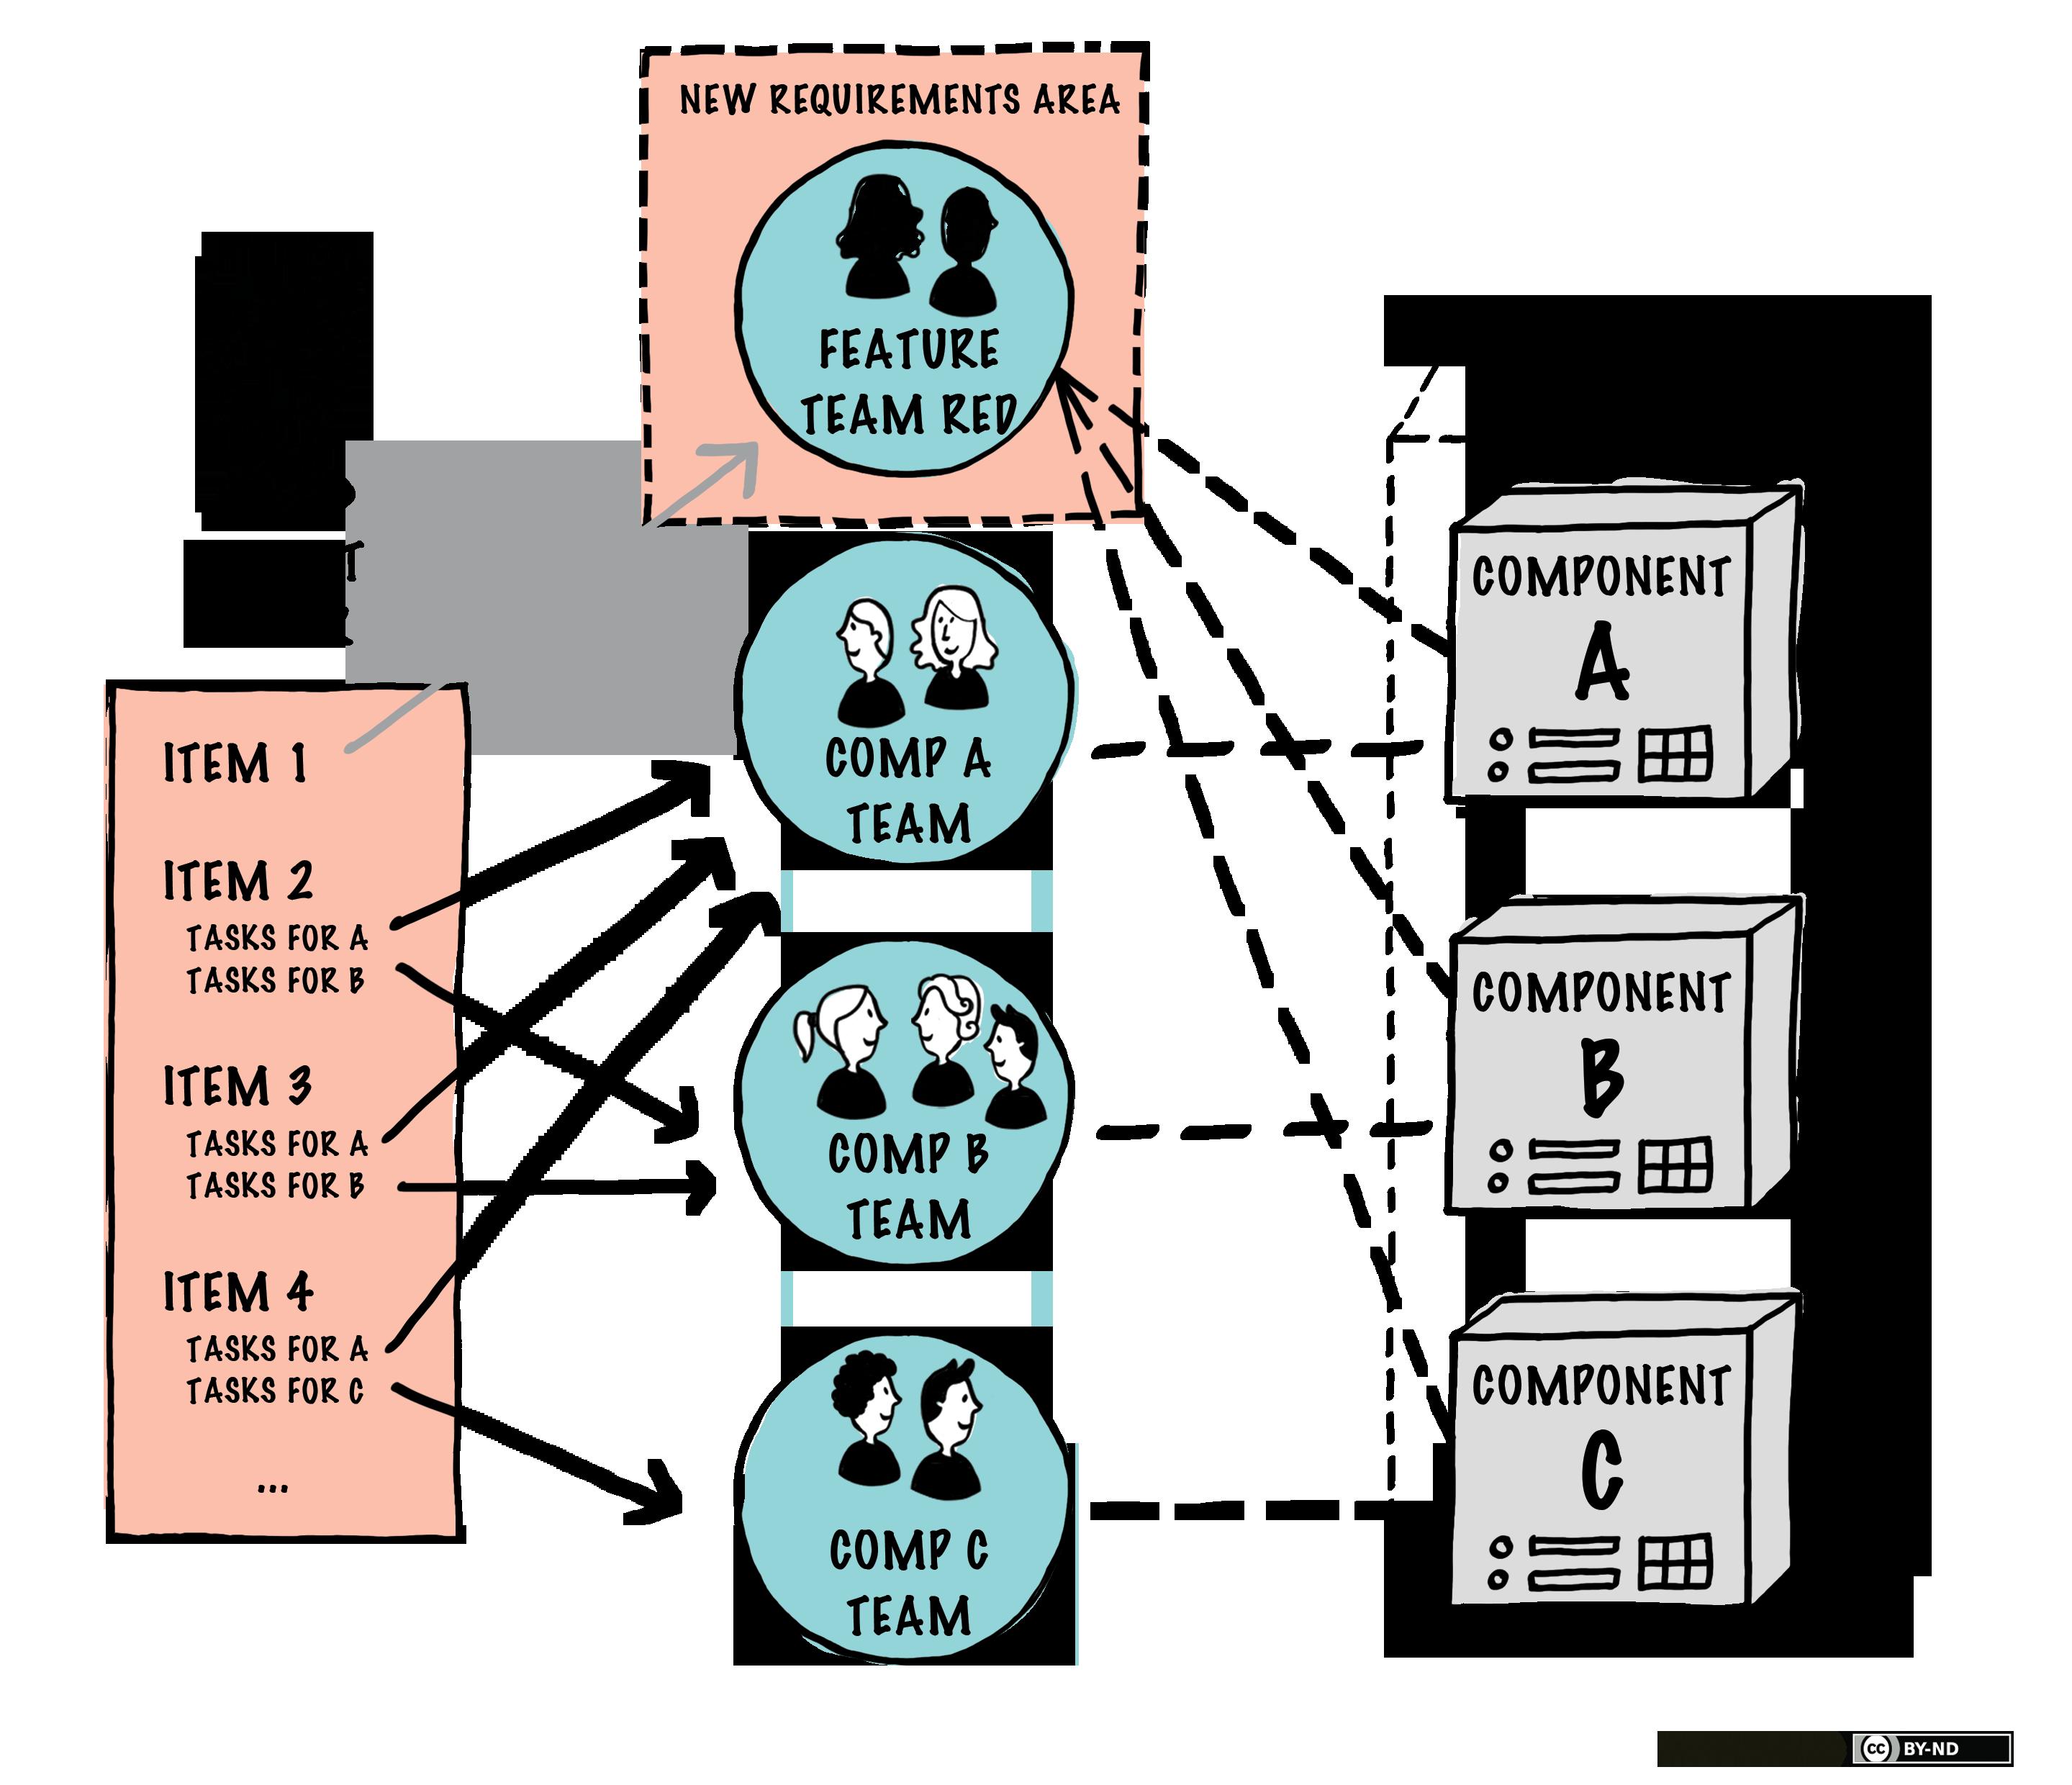 Organizing using Section Organizations